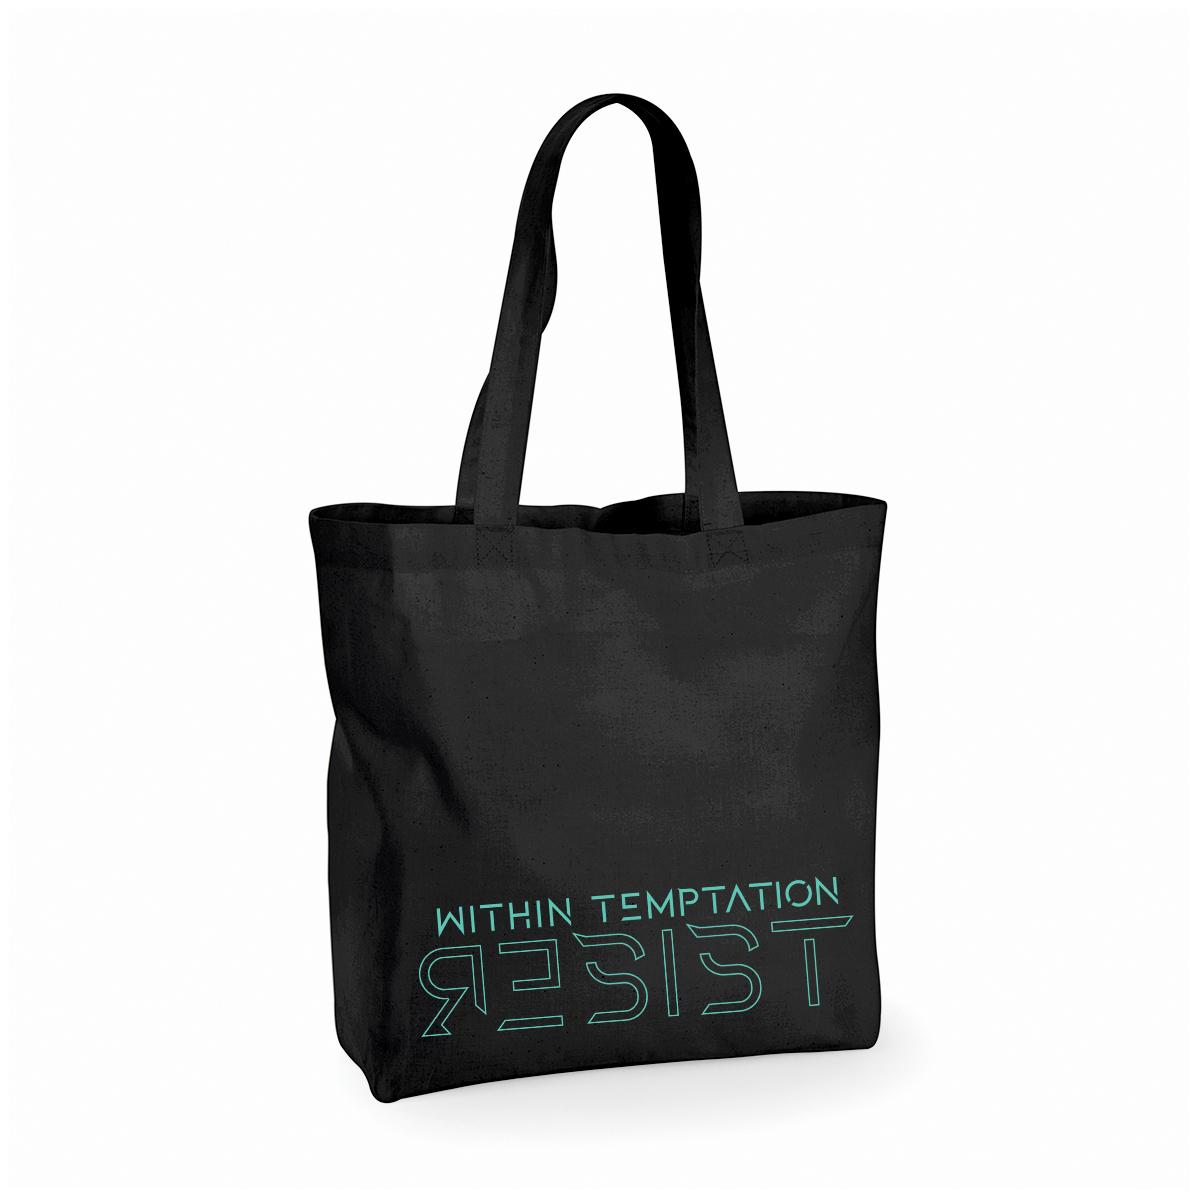 3D Resist – Shopper Bag - Within Temptation